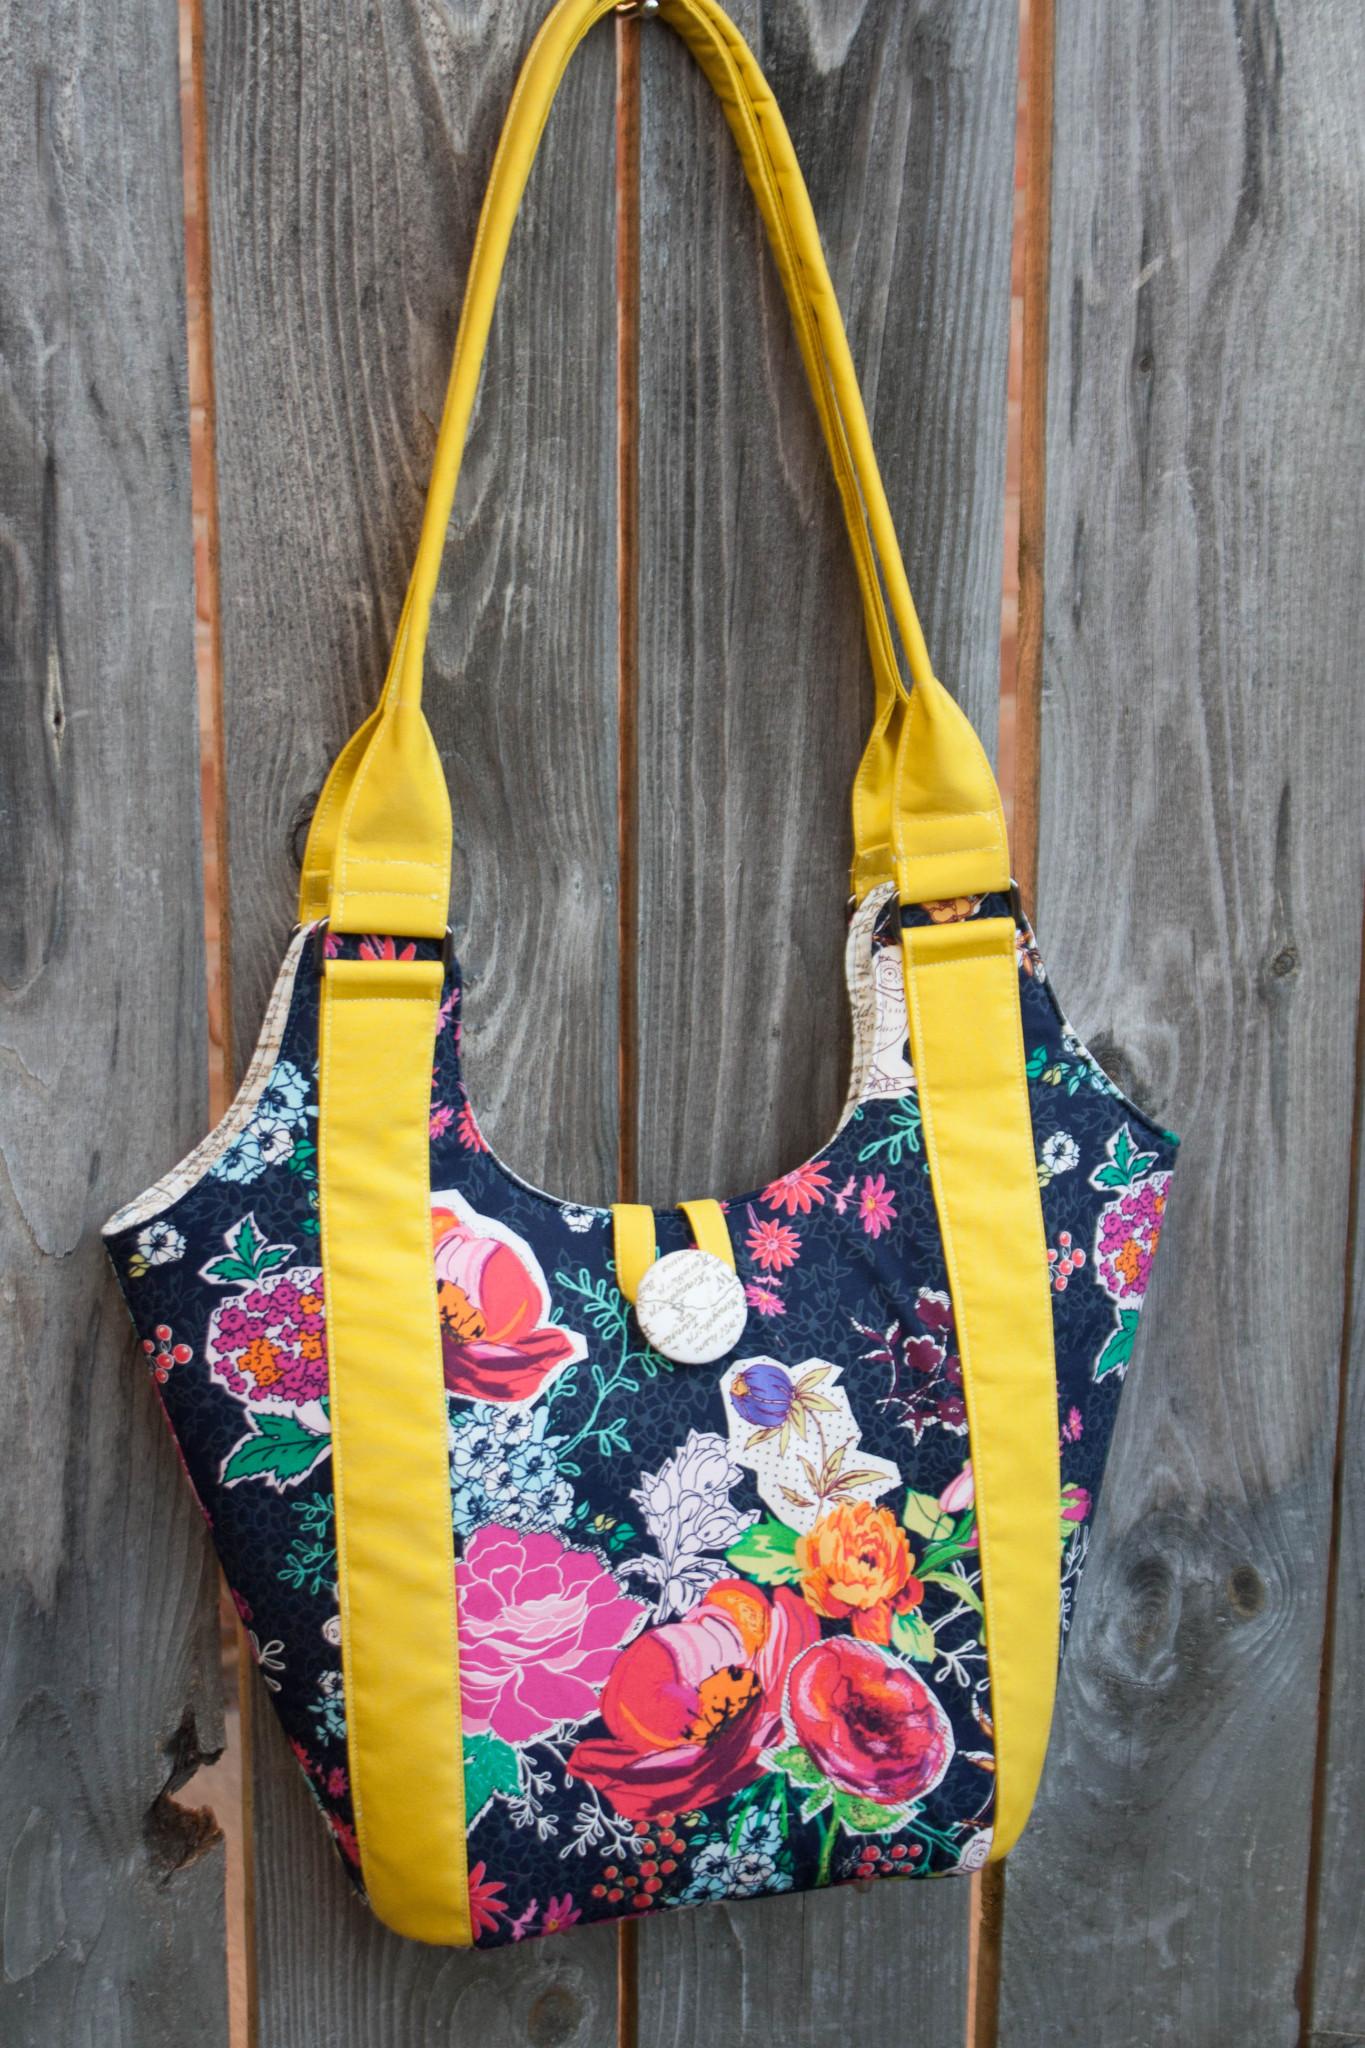 women/'s bag yellow purse anna maria horner bag Zippered shoulder bag zippered purse zippered tote bag women/'s purse floral purse